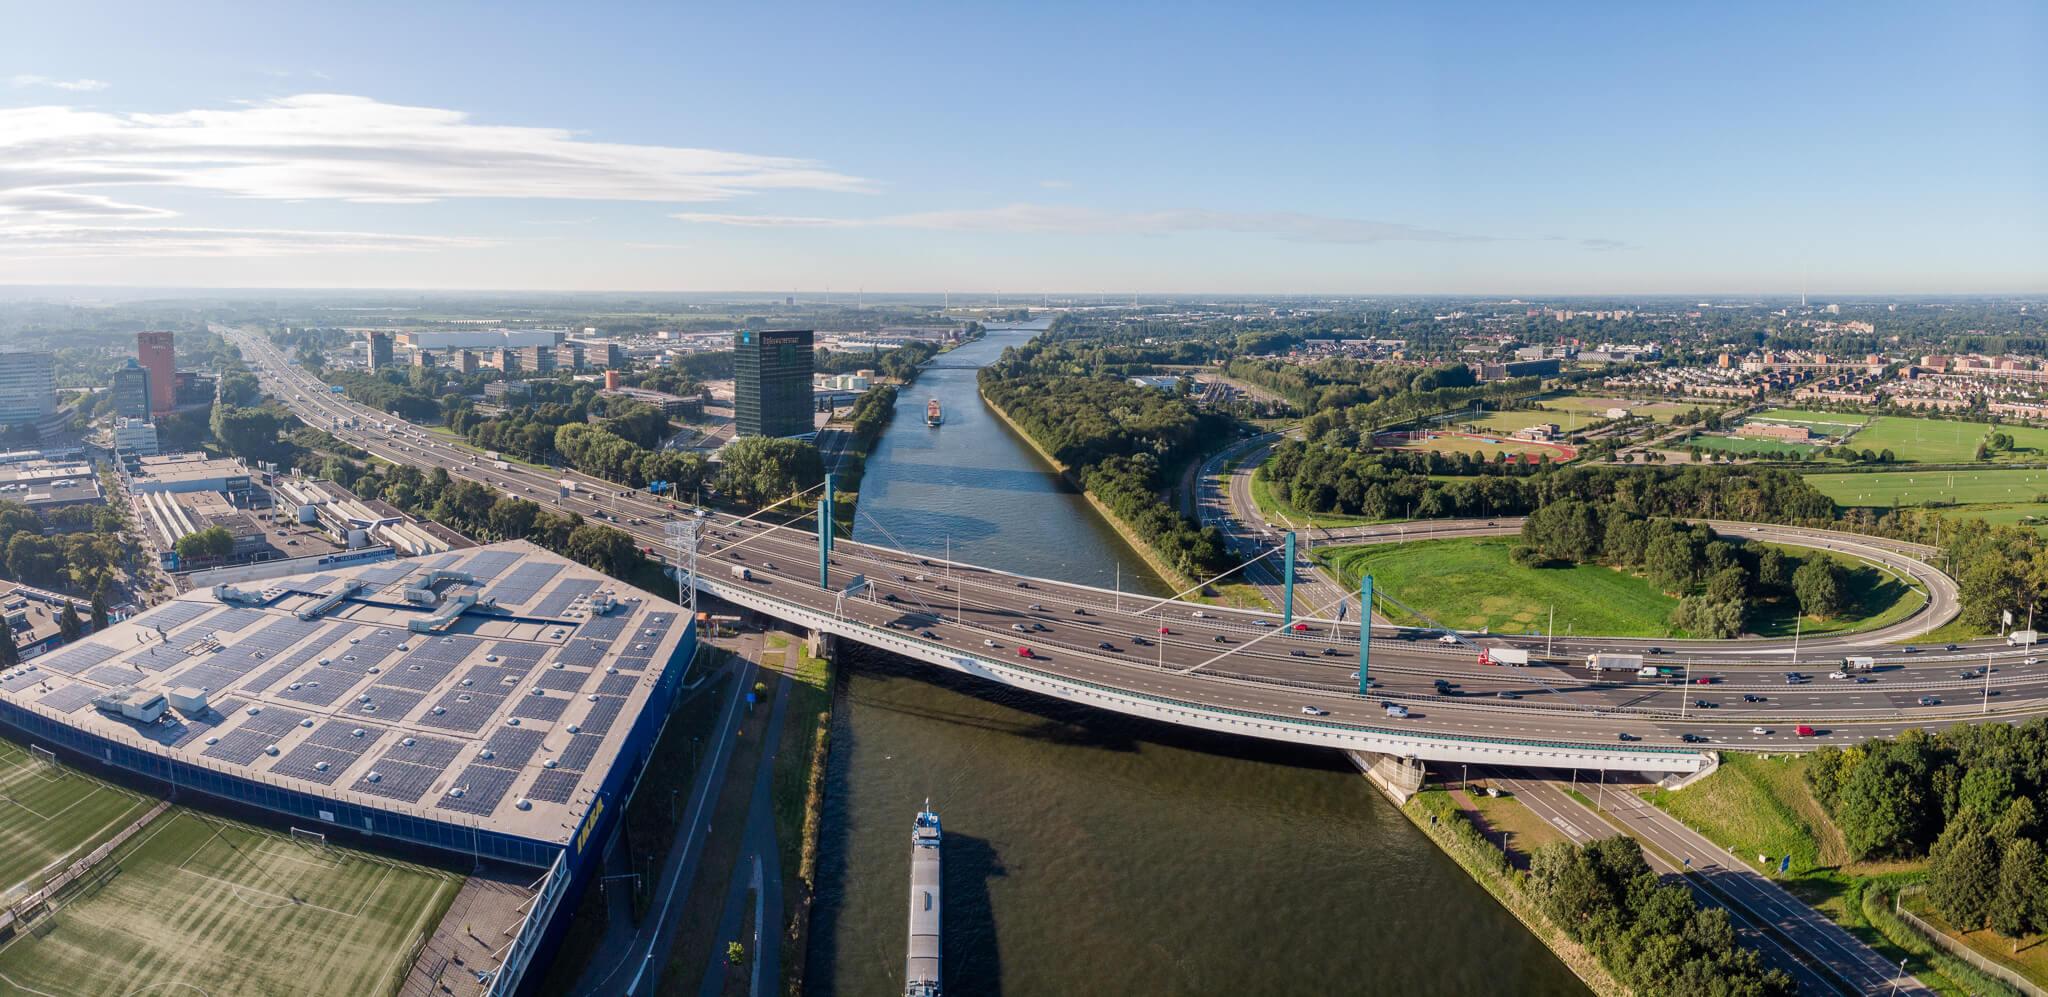 Gemeente Nieuwegein_DJI_0190-Pano_WHP_webHD